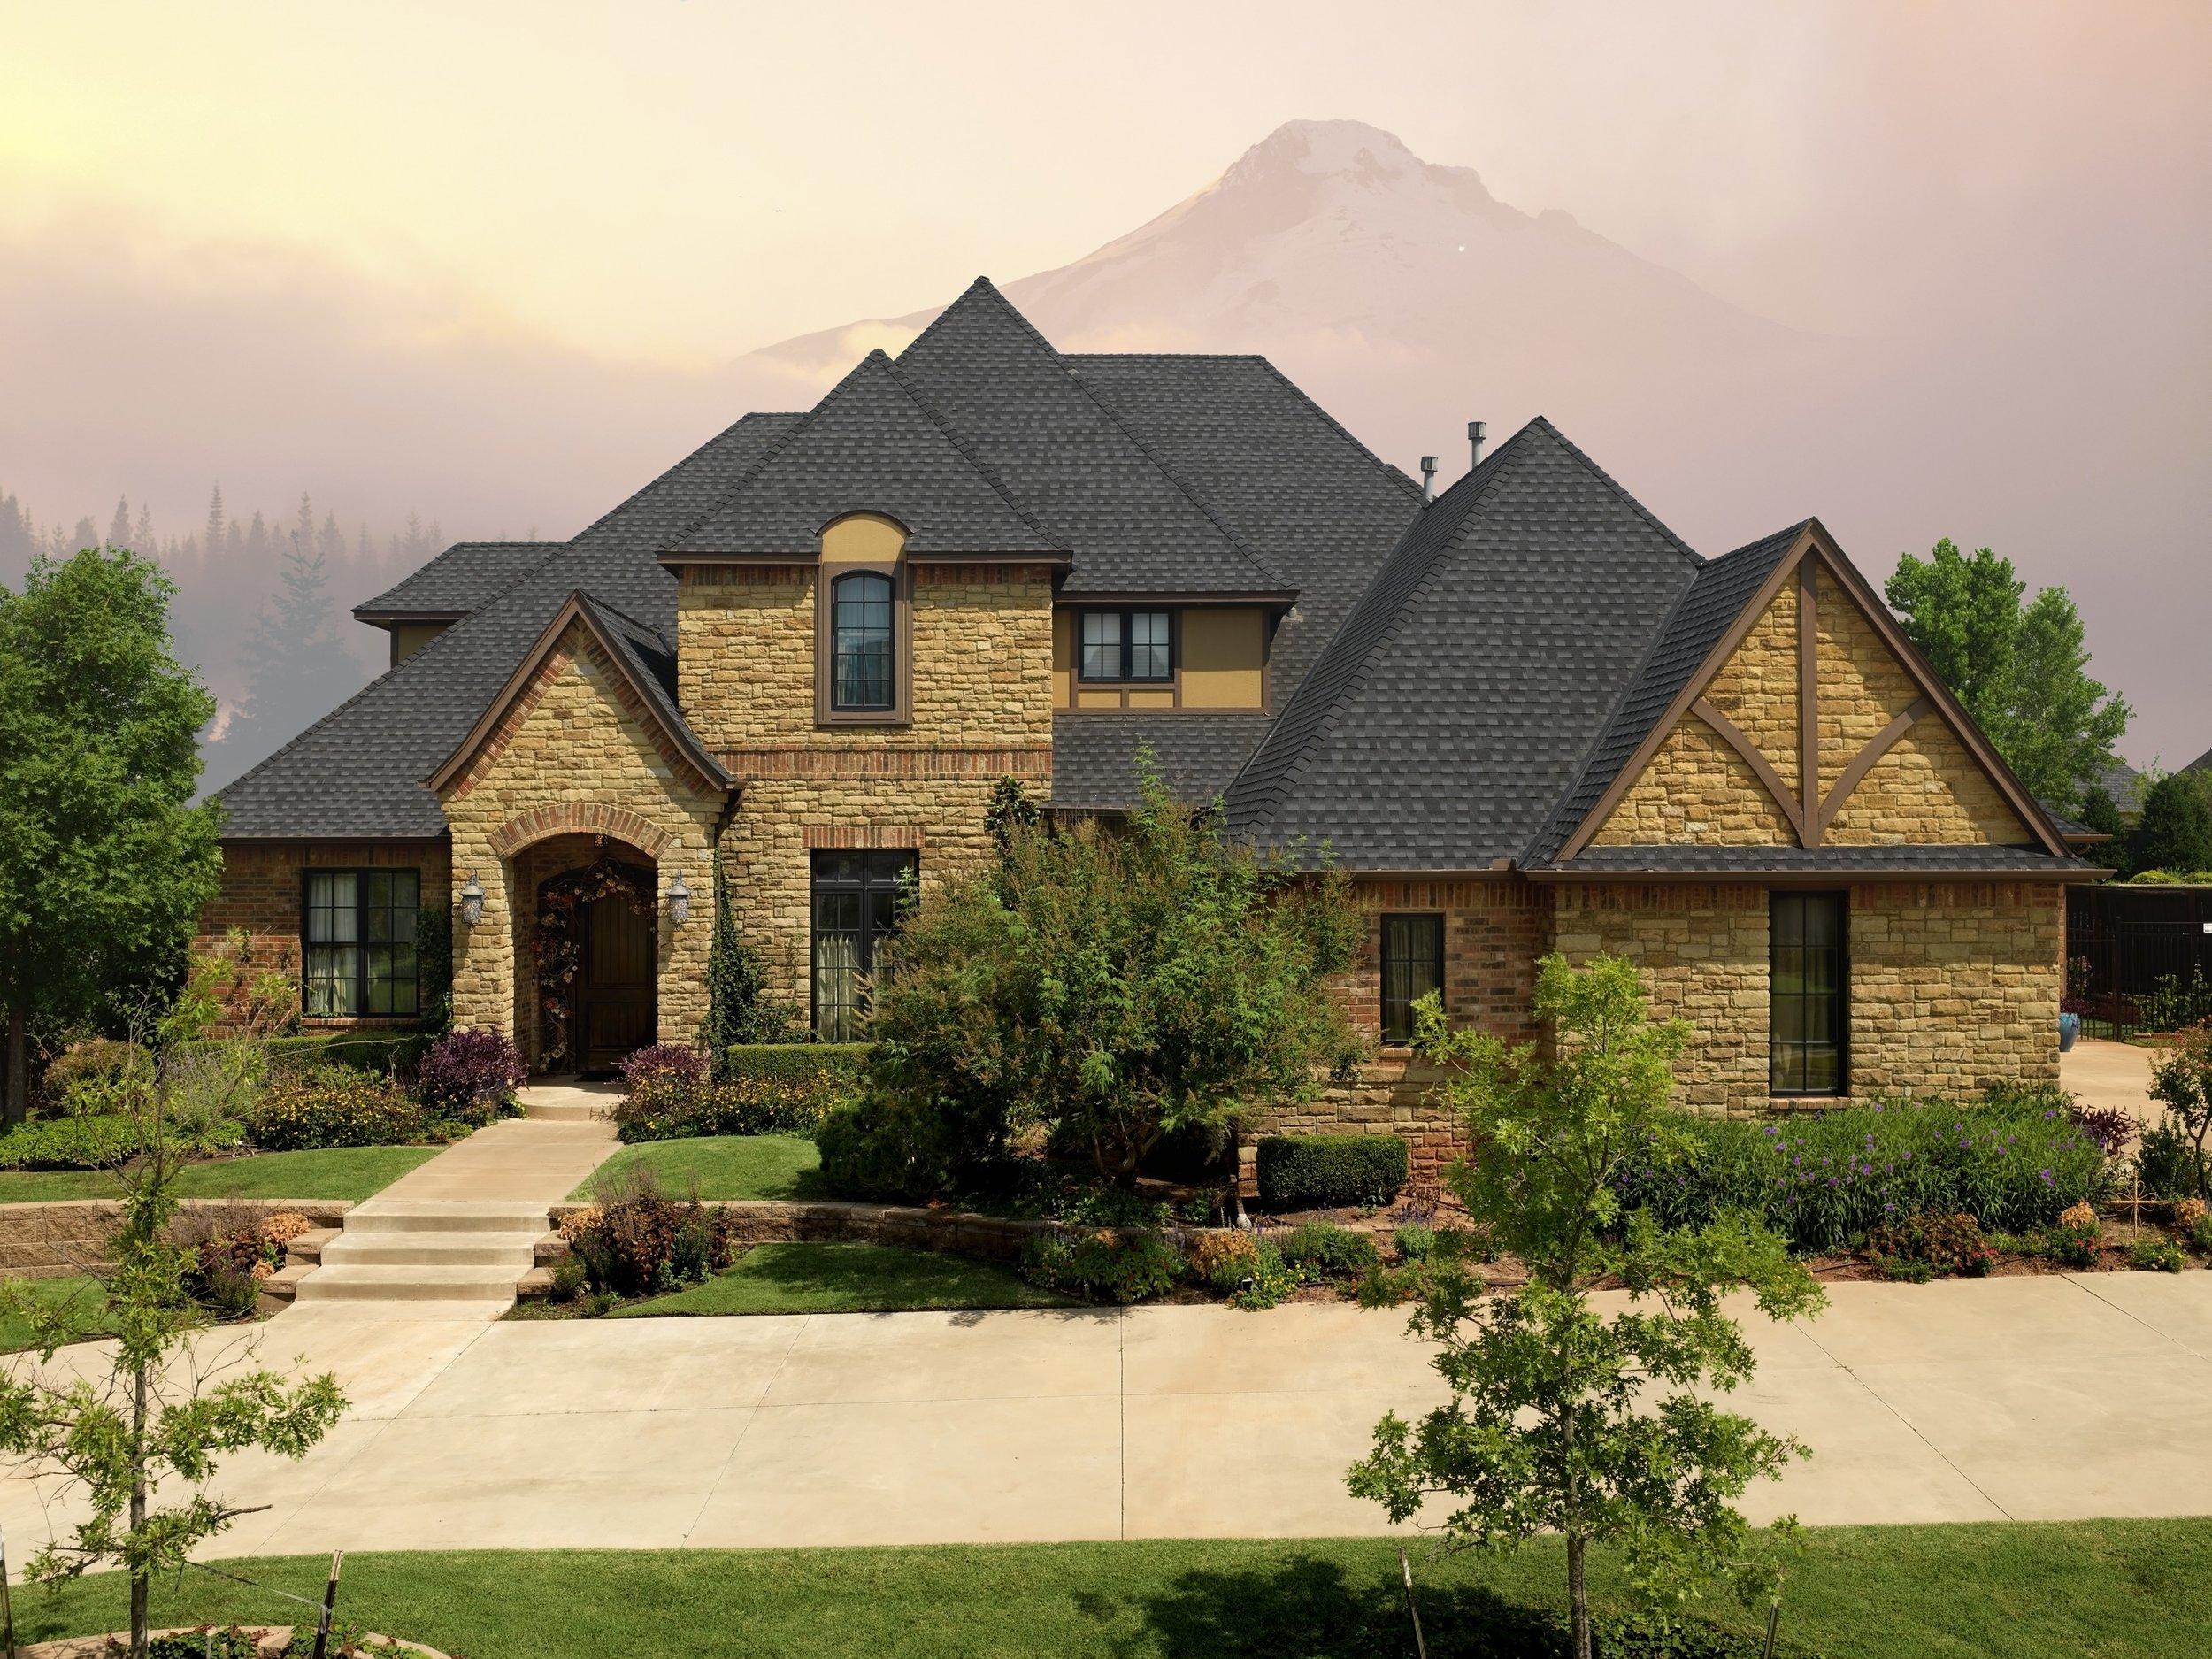 rsz_gaf_timberline_ultra_hd_charcoal_house.jpg